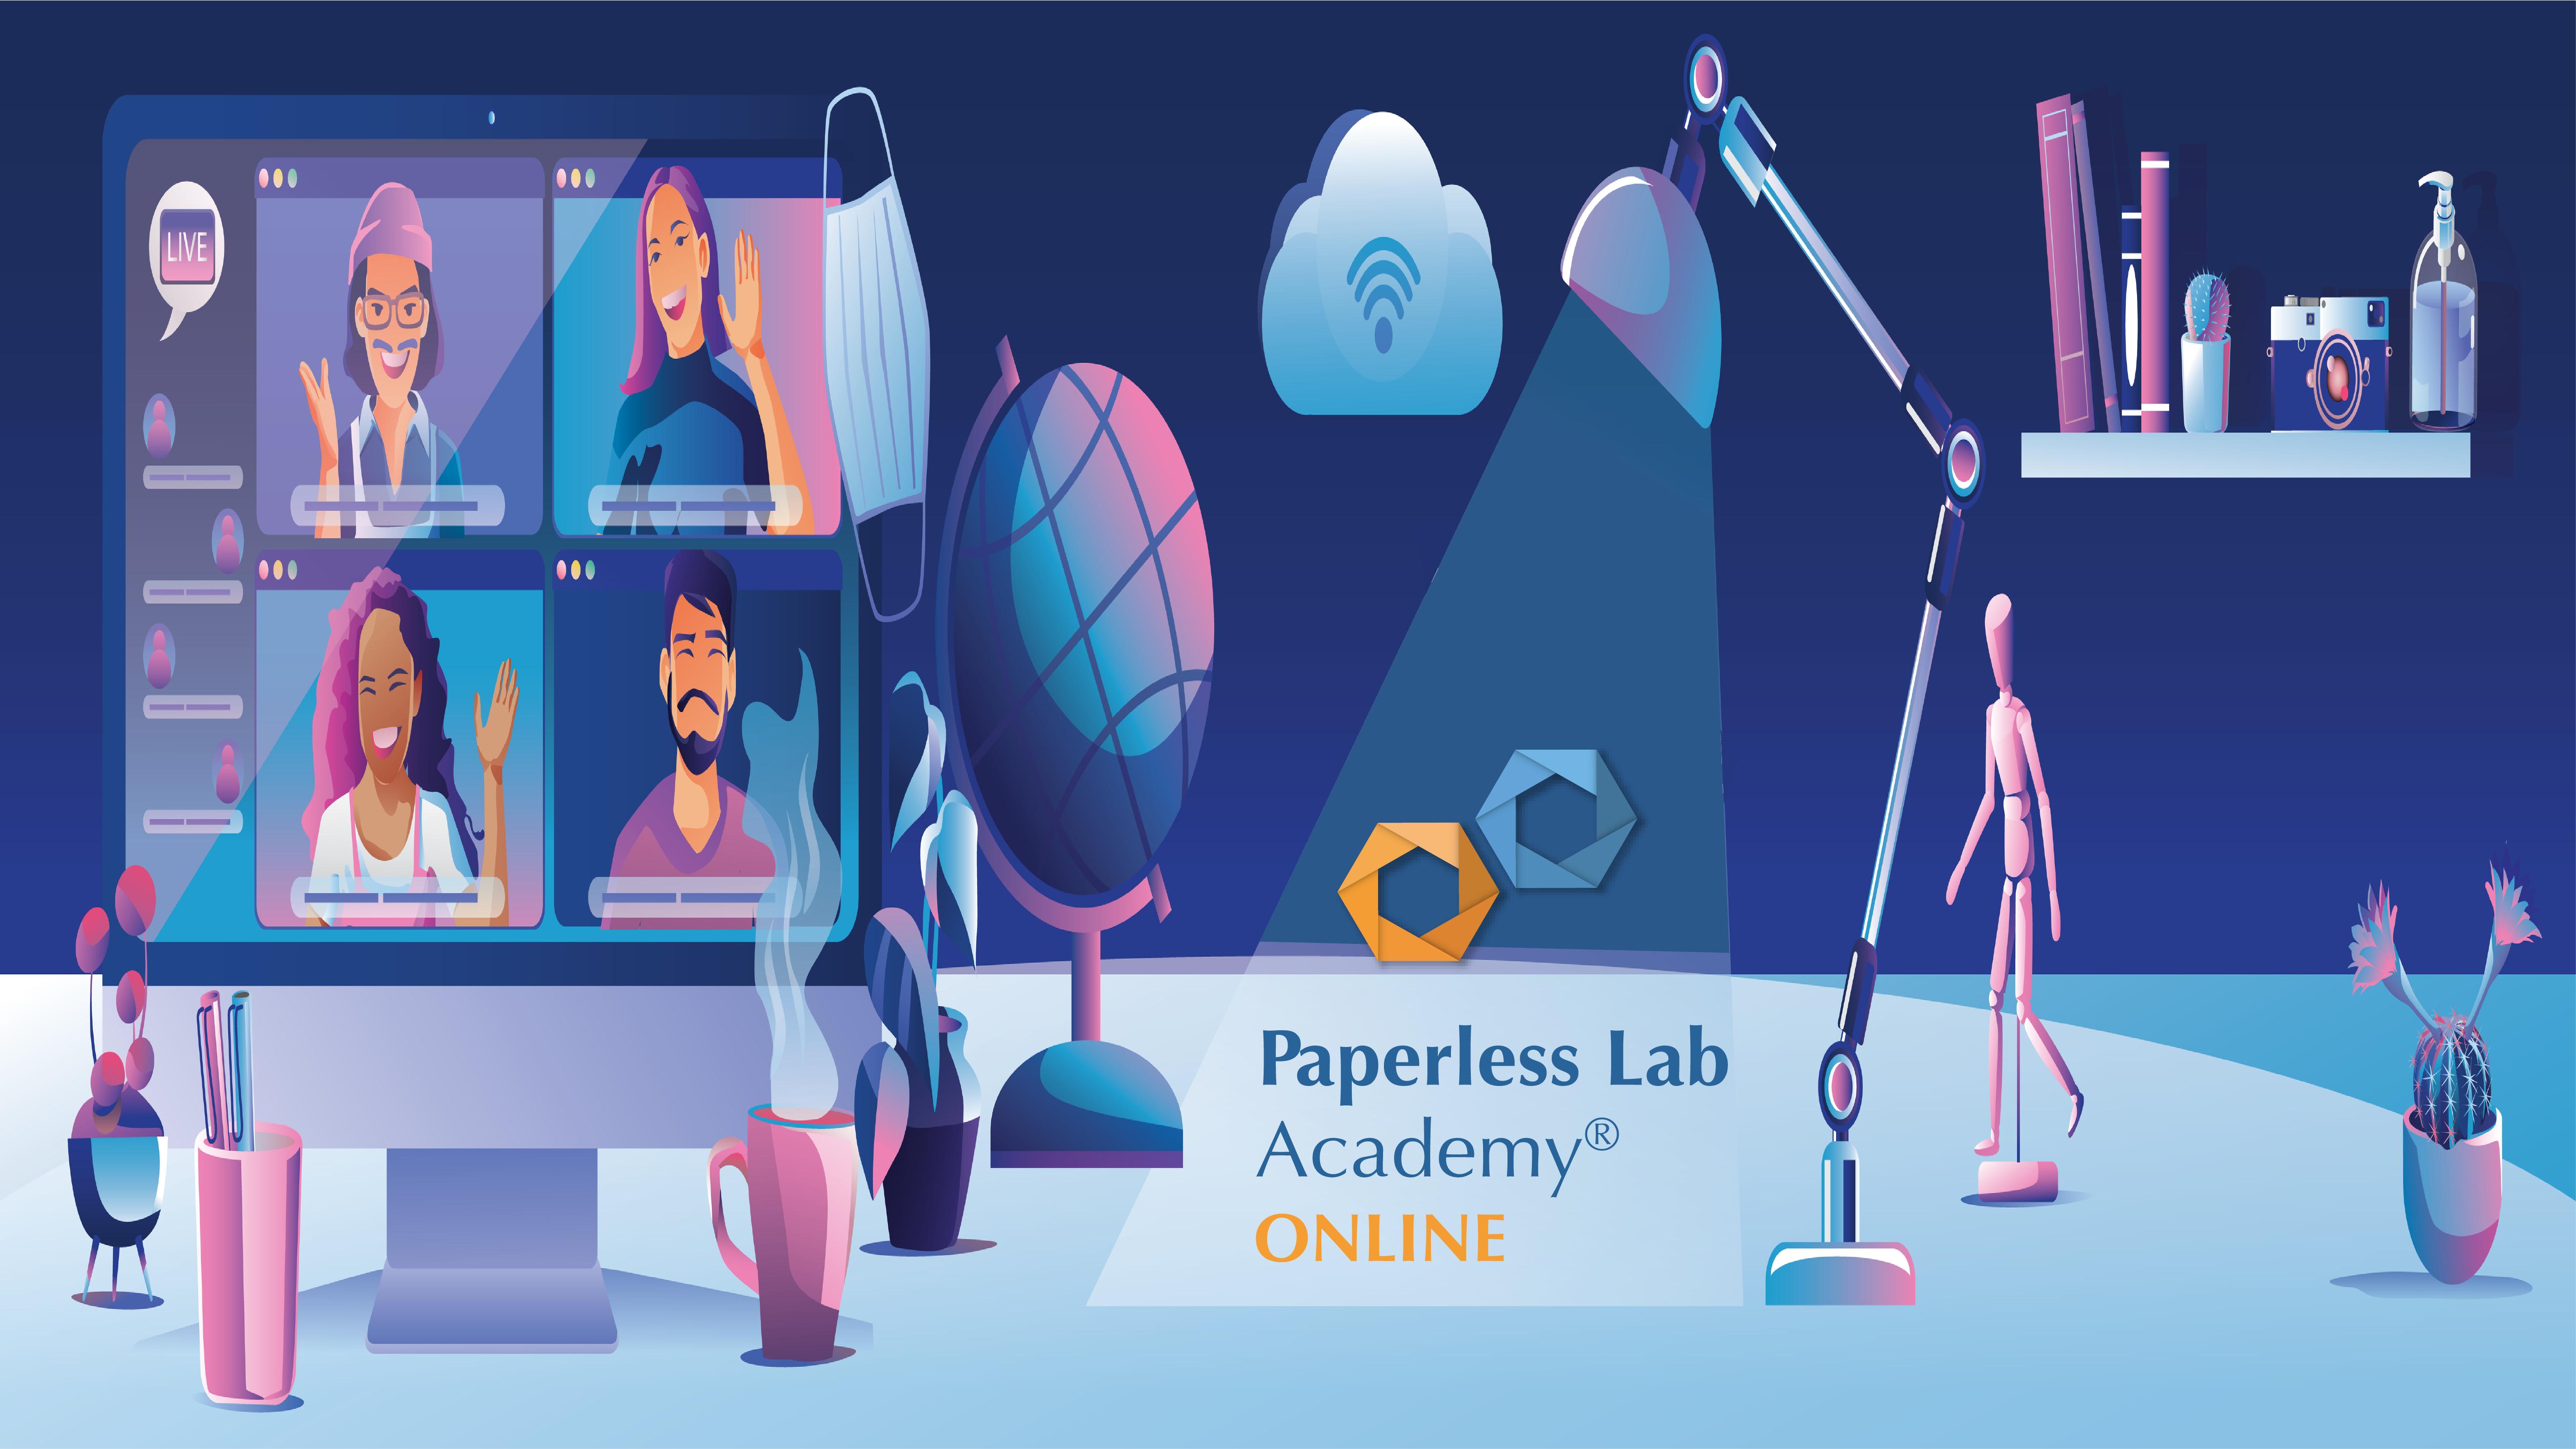 Paperless lab academy virtual edition